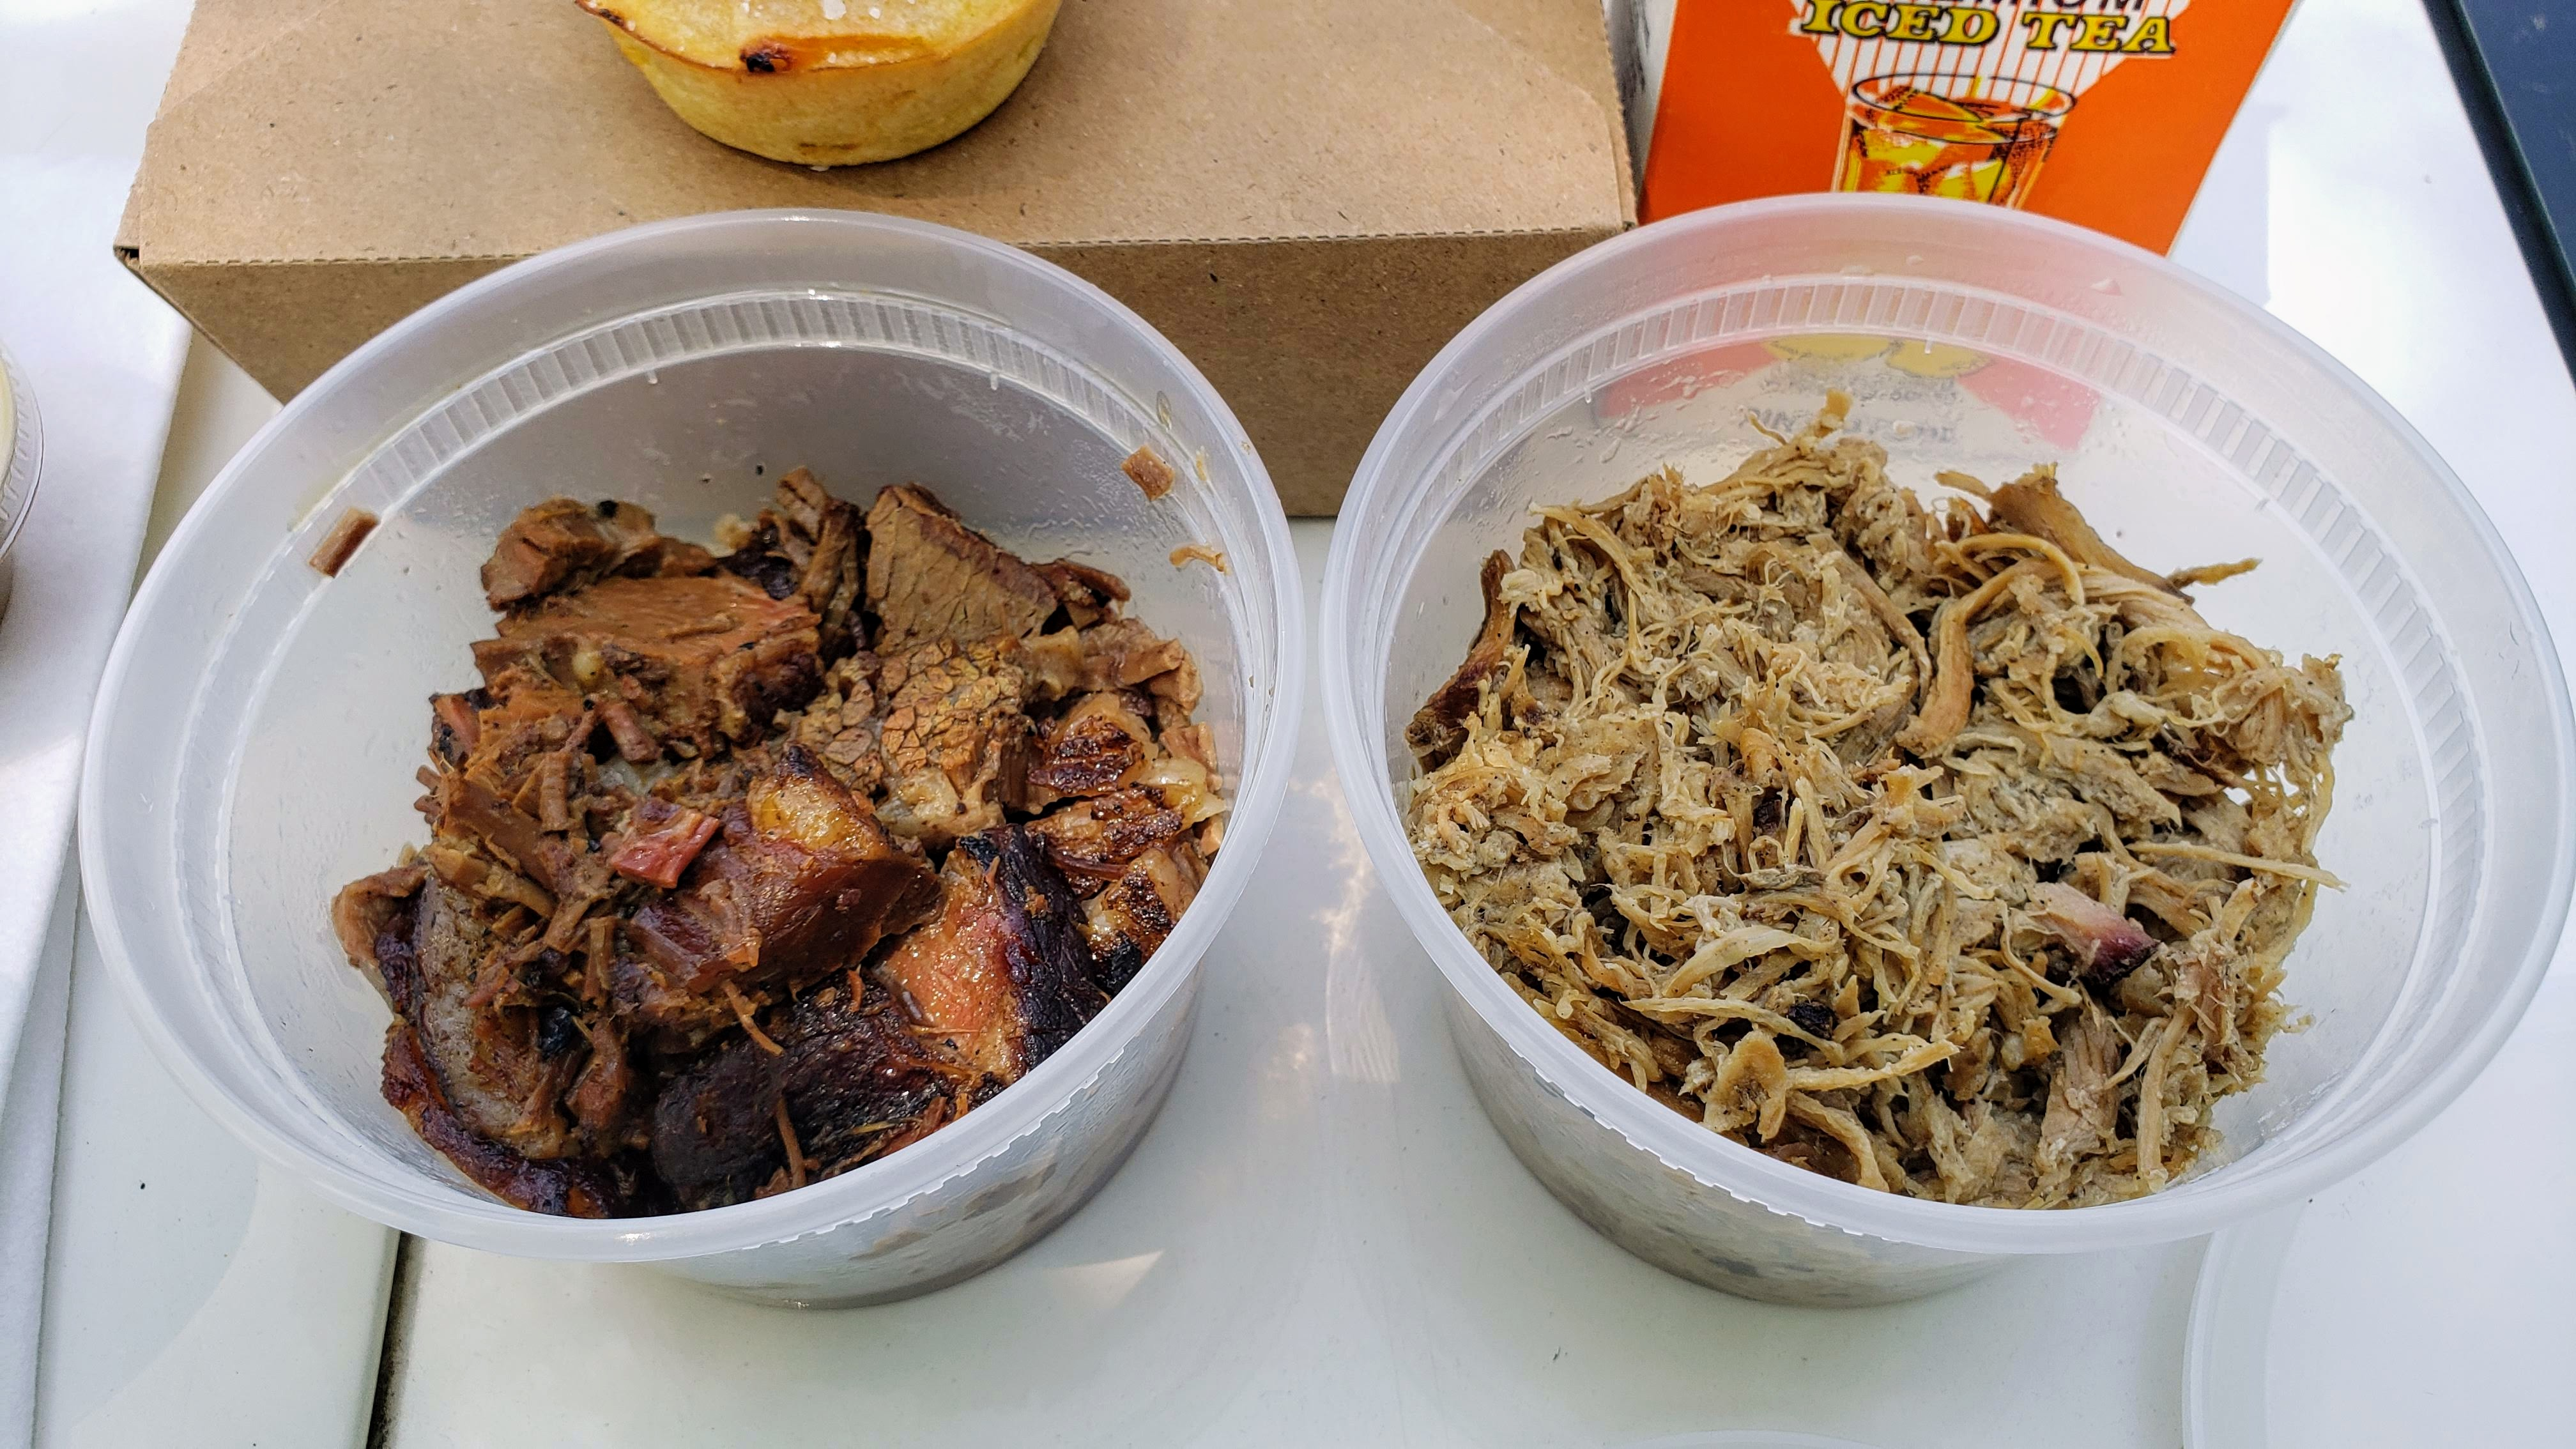 Burk's Barbeque brisket and pulled pork